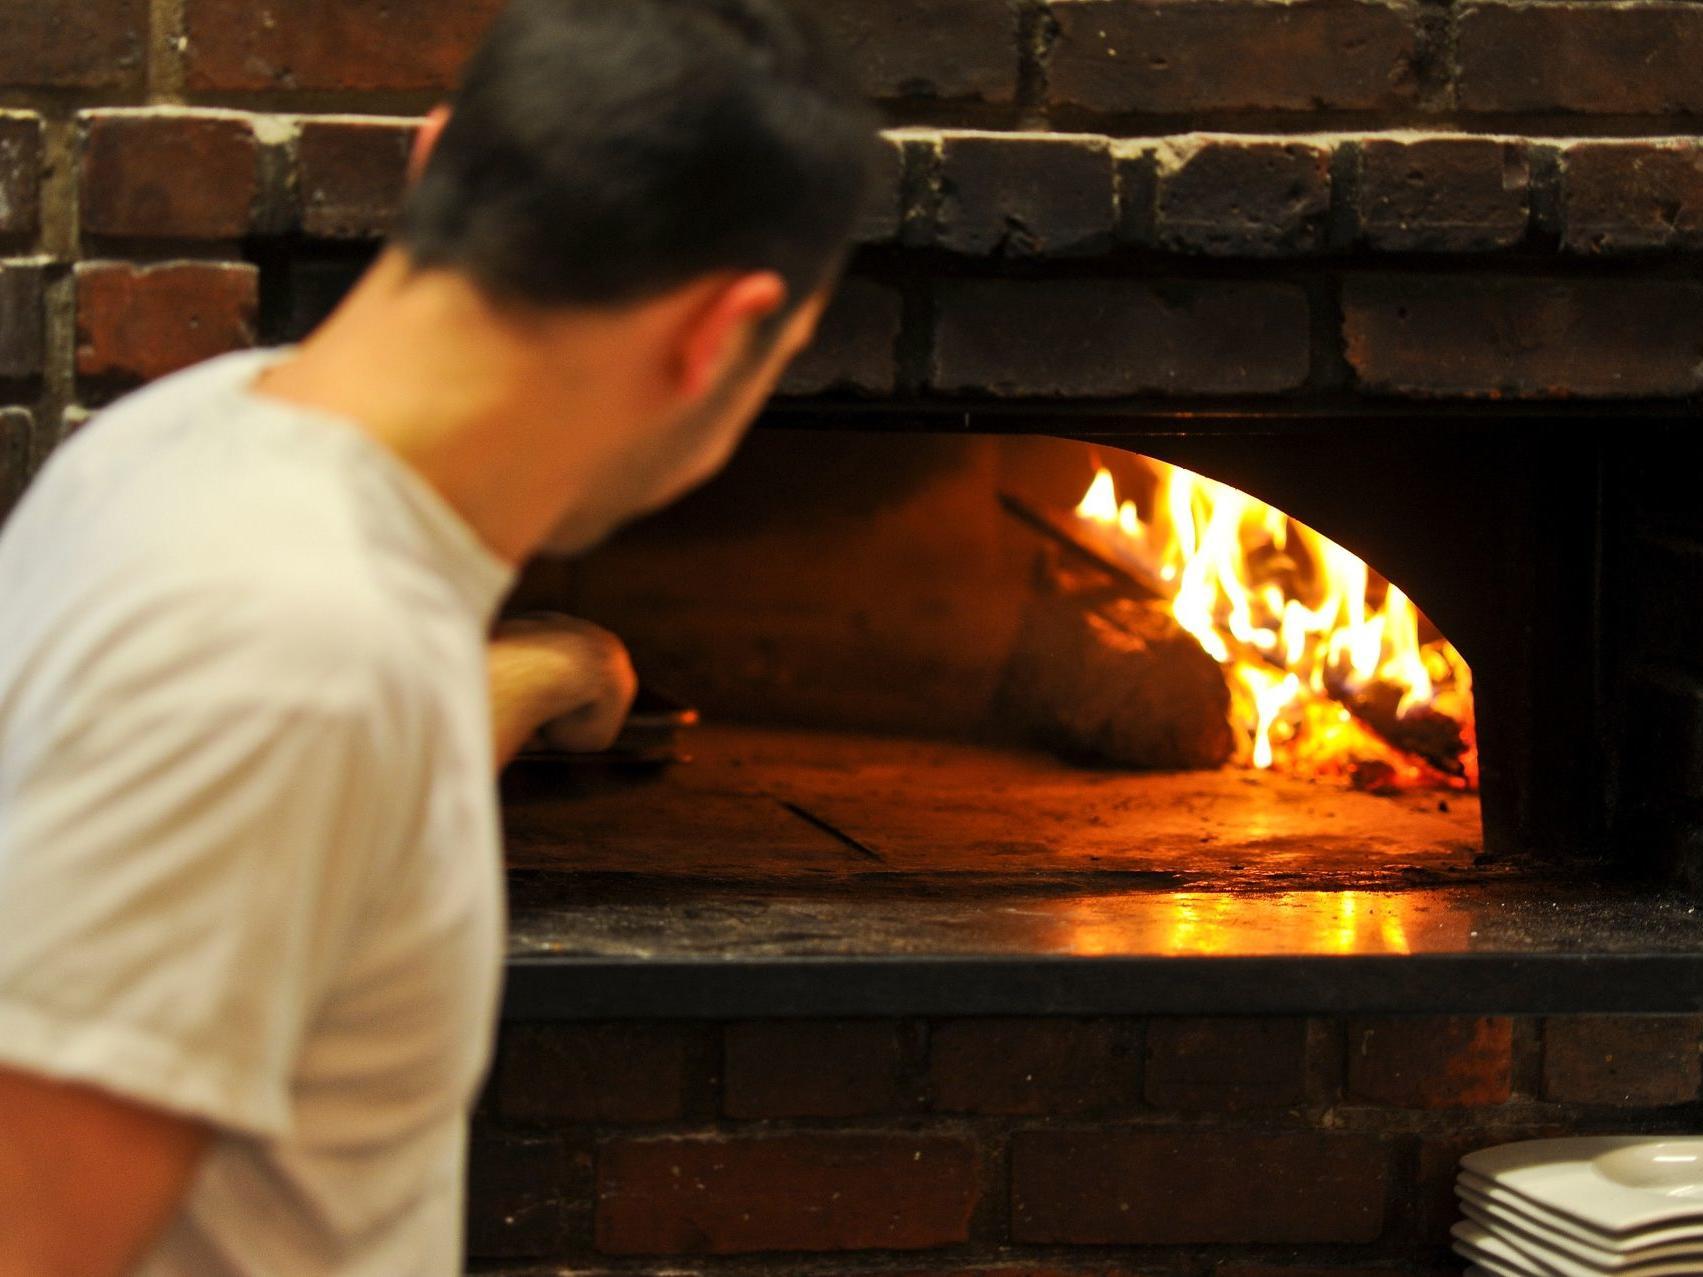 View of masonry oven in Piccolo Arancio at Farmington Inn and Suites